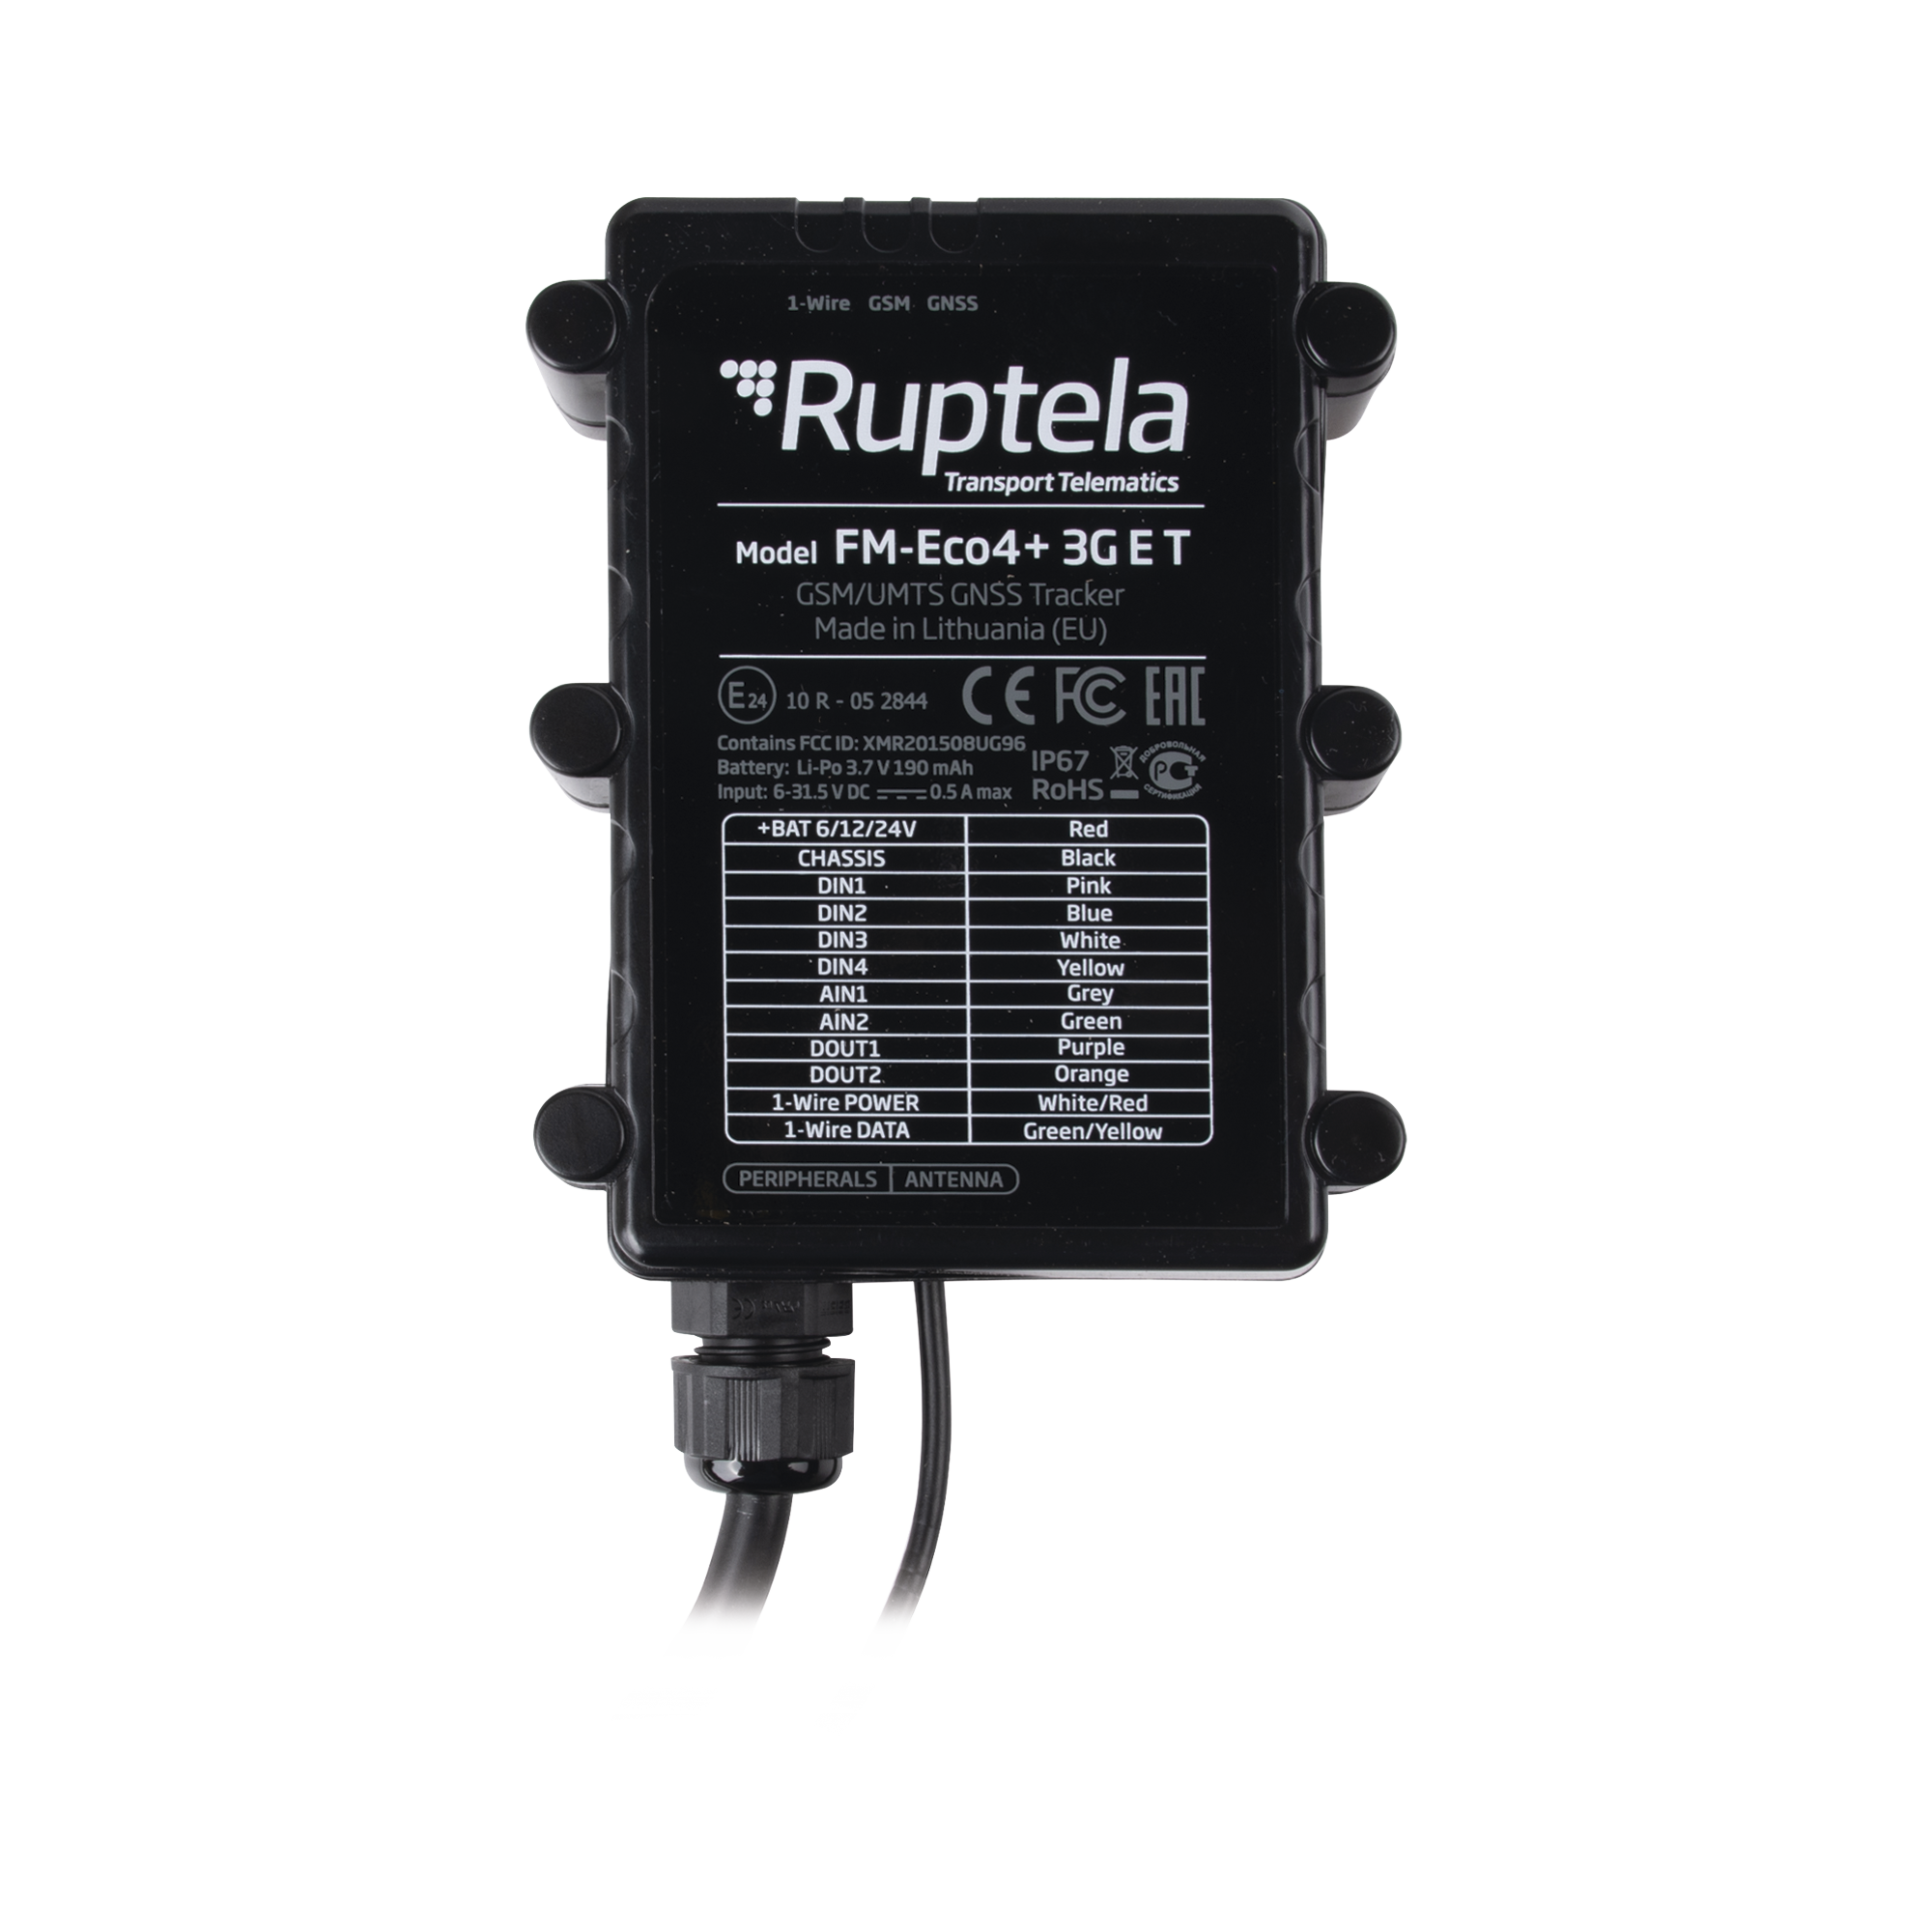 Localizador vehicular 3G / Antena Satelital Externa / Contra agua y polvo IP67 / RFID / Apagado de motor a distancia / Anti Jammer